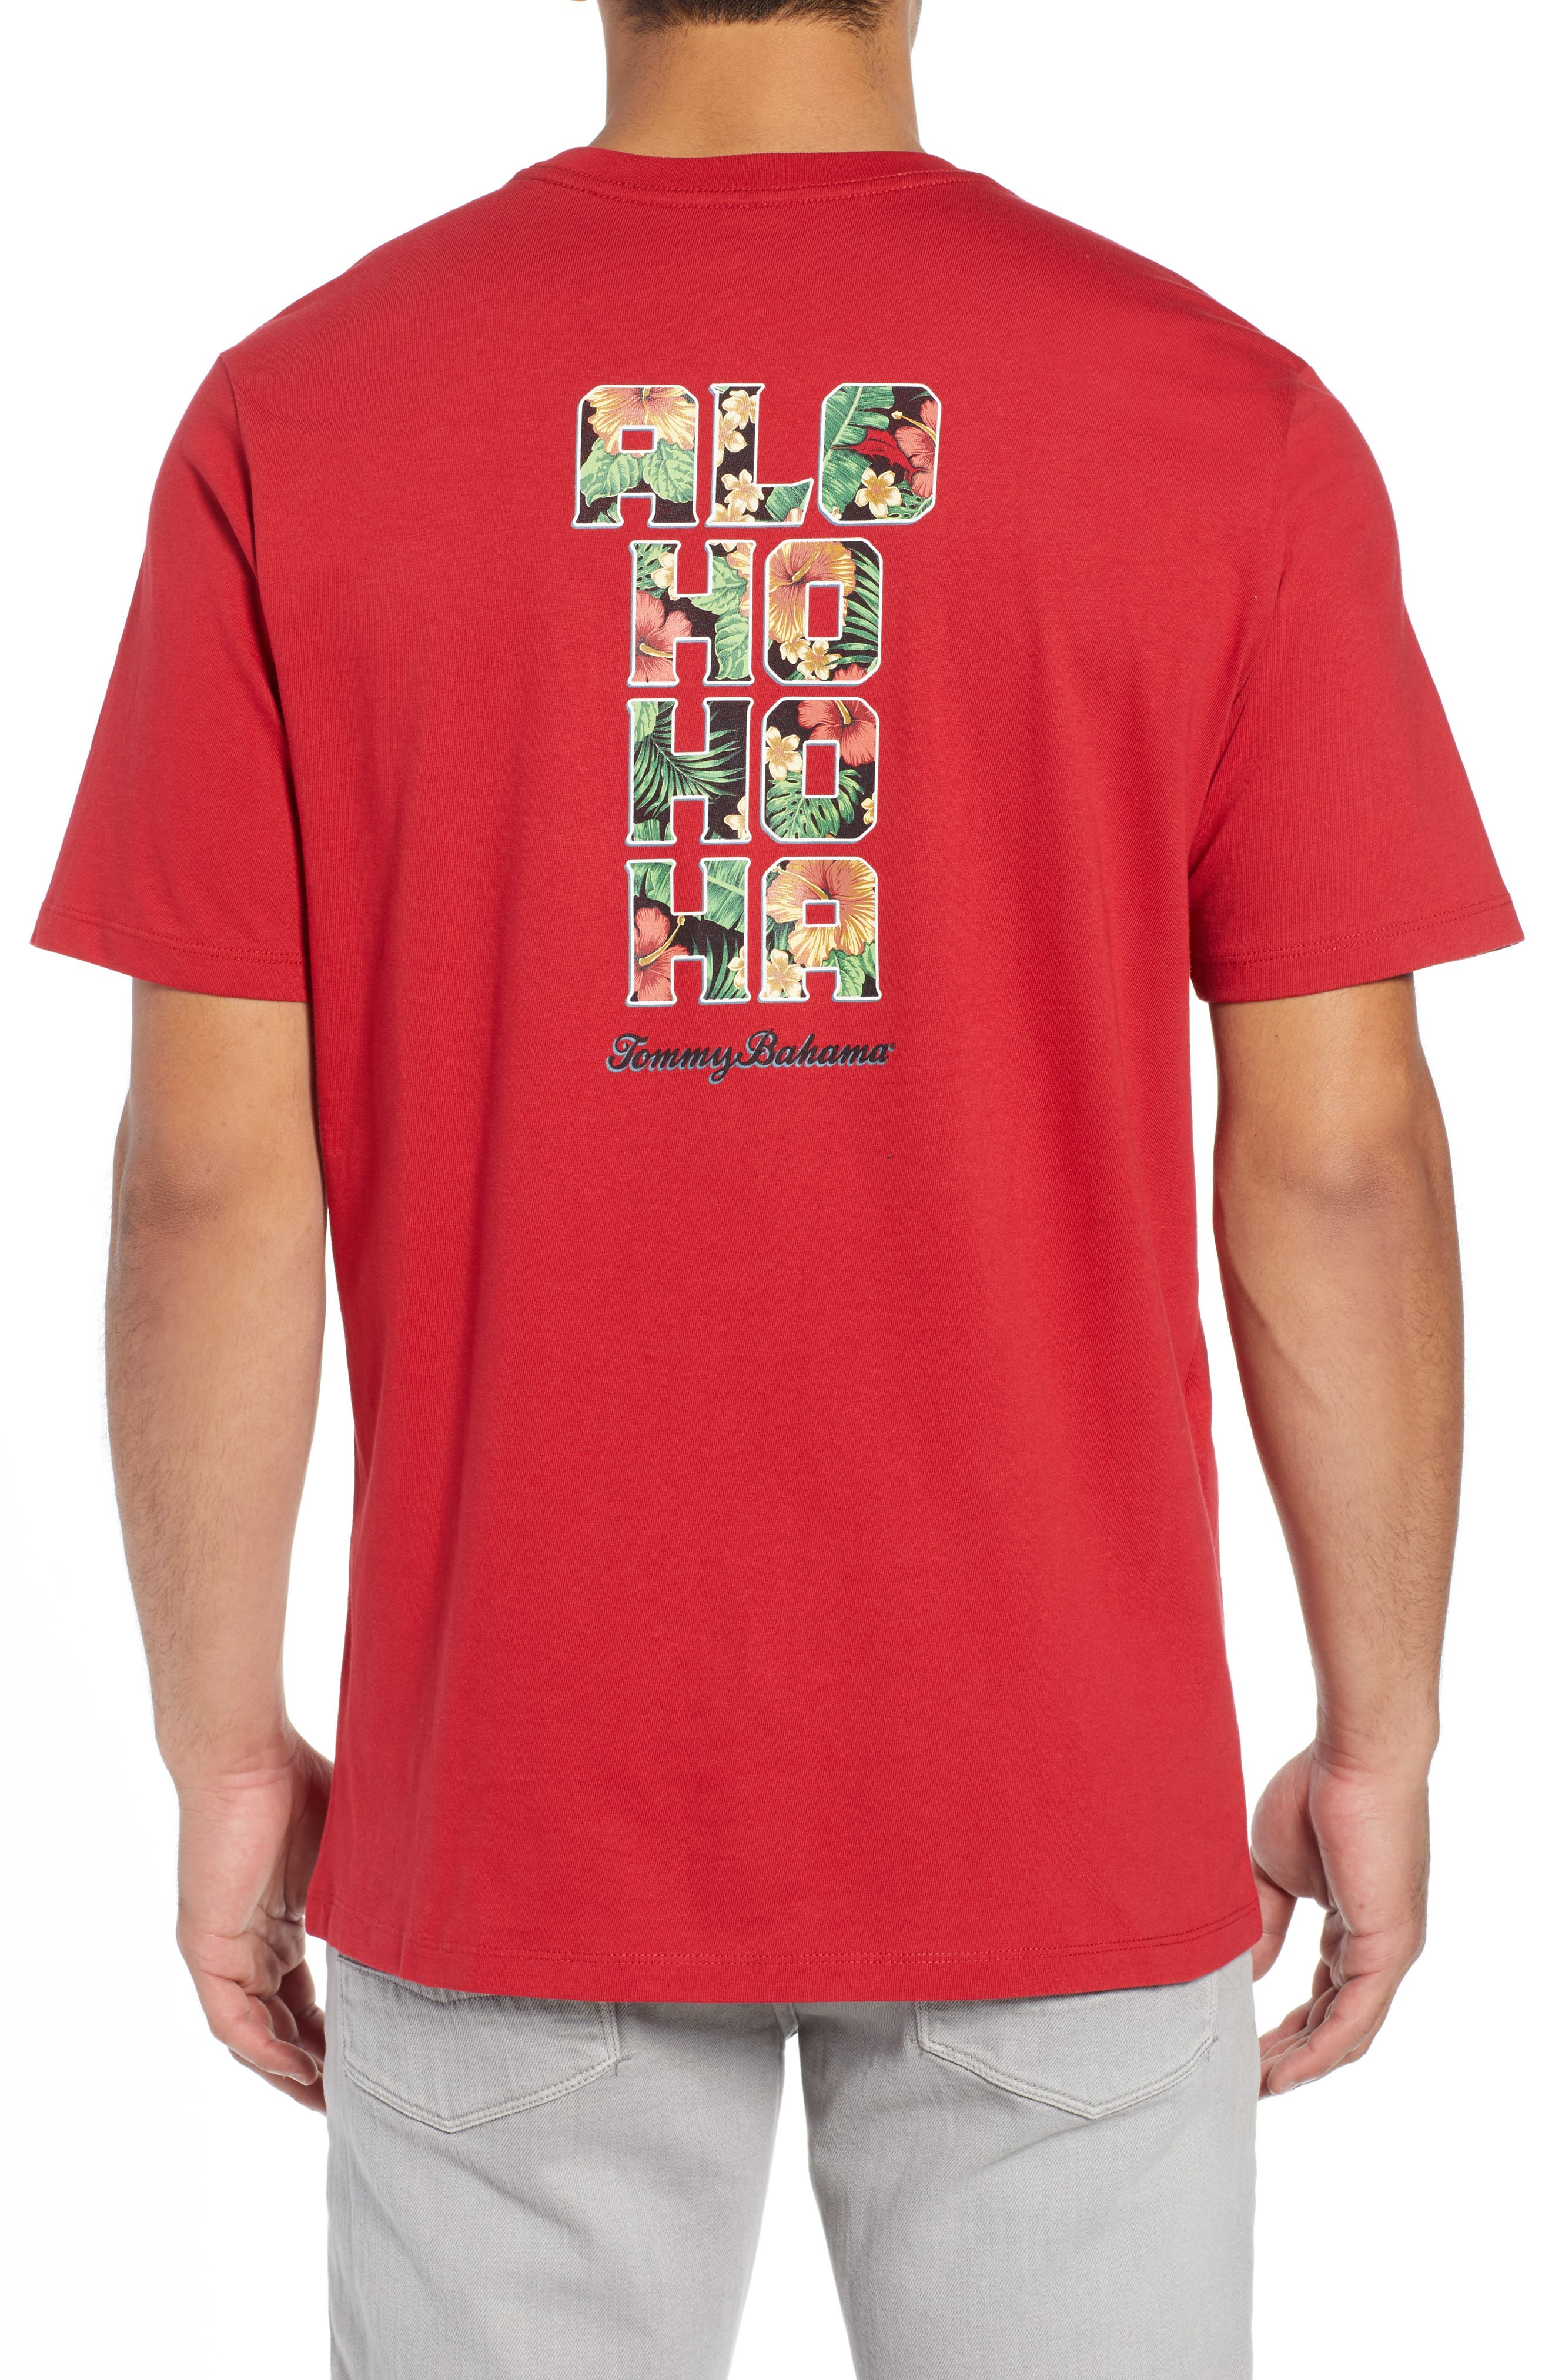 TOMMY BAHAMA, Alo-Ho Ho-Ha Graphic T-Shirt, Alternate thumbnail 2, color, SCOOTER RED